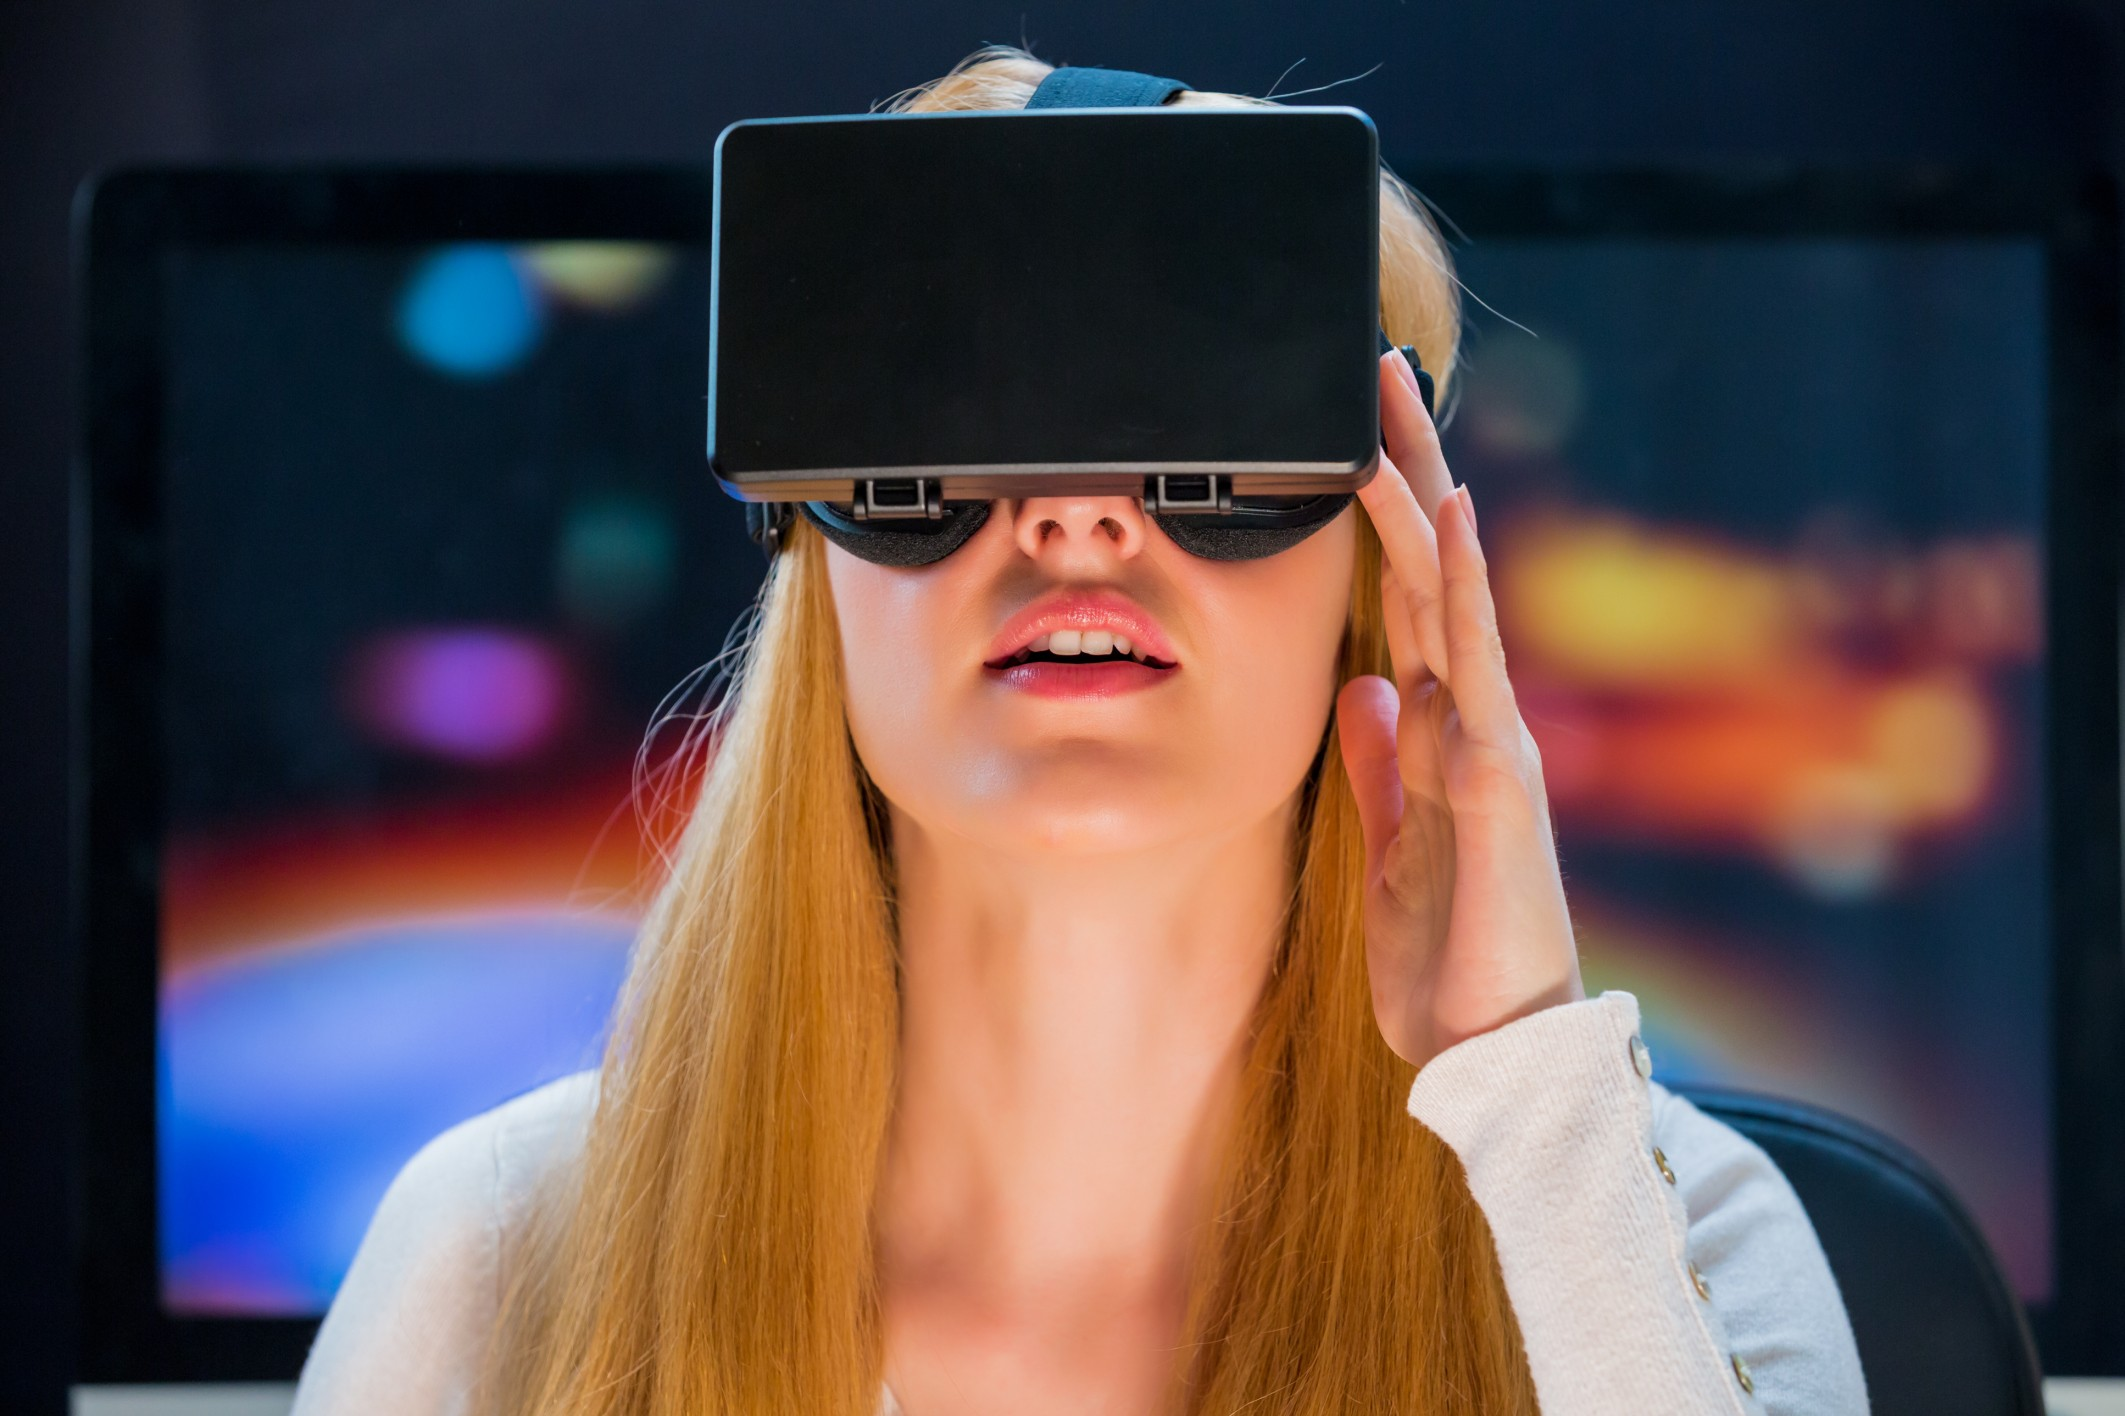 realidade virtual (Foto: Thinkstock)